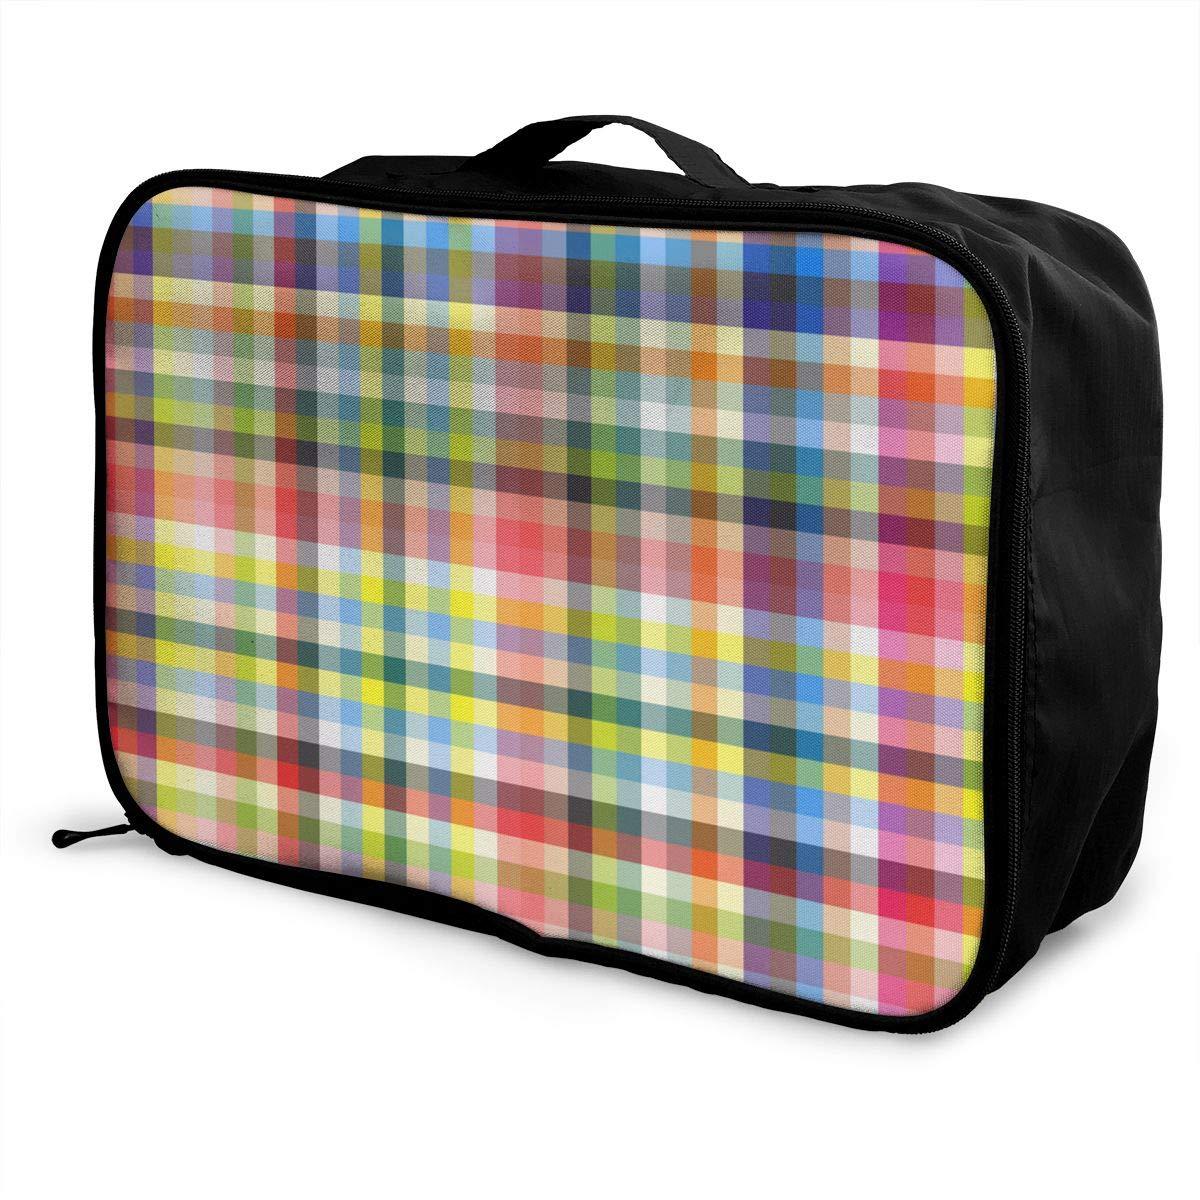 ADGAI Interesting Person Canvas Travel Weekender Bag,Fashion Custom Lightweight Large Capacity Portable Luggage Bag,Suitcase Trolley Bag